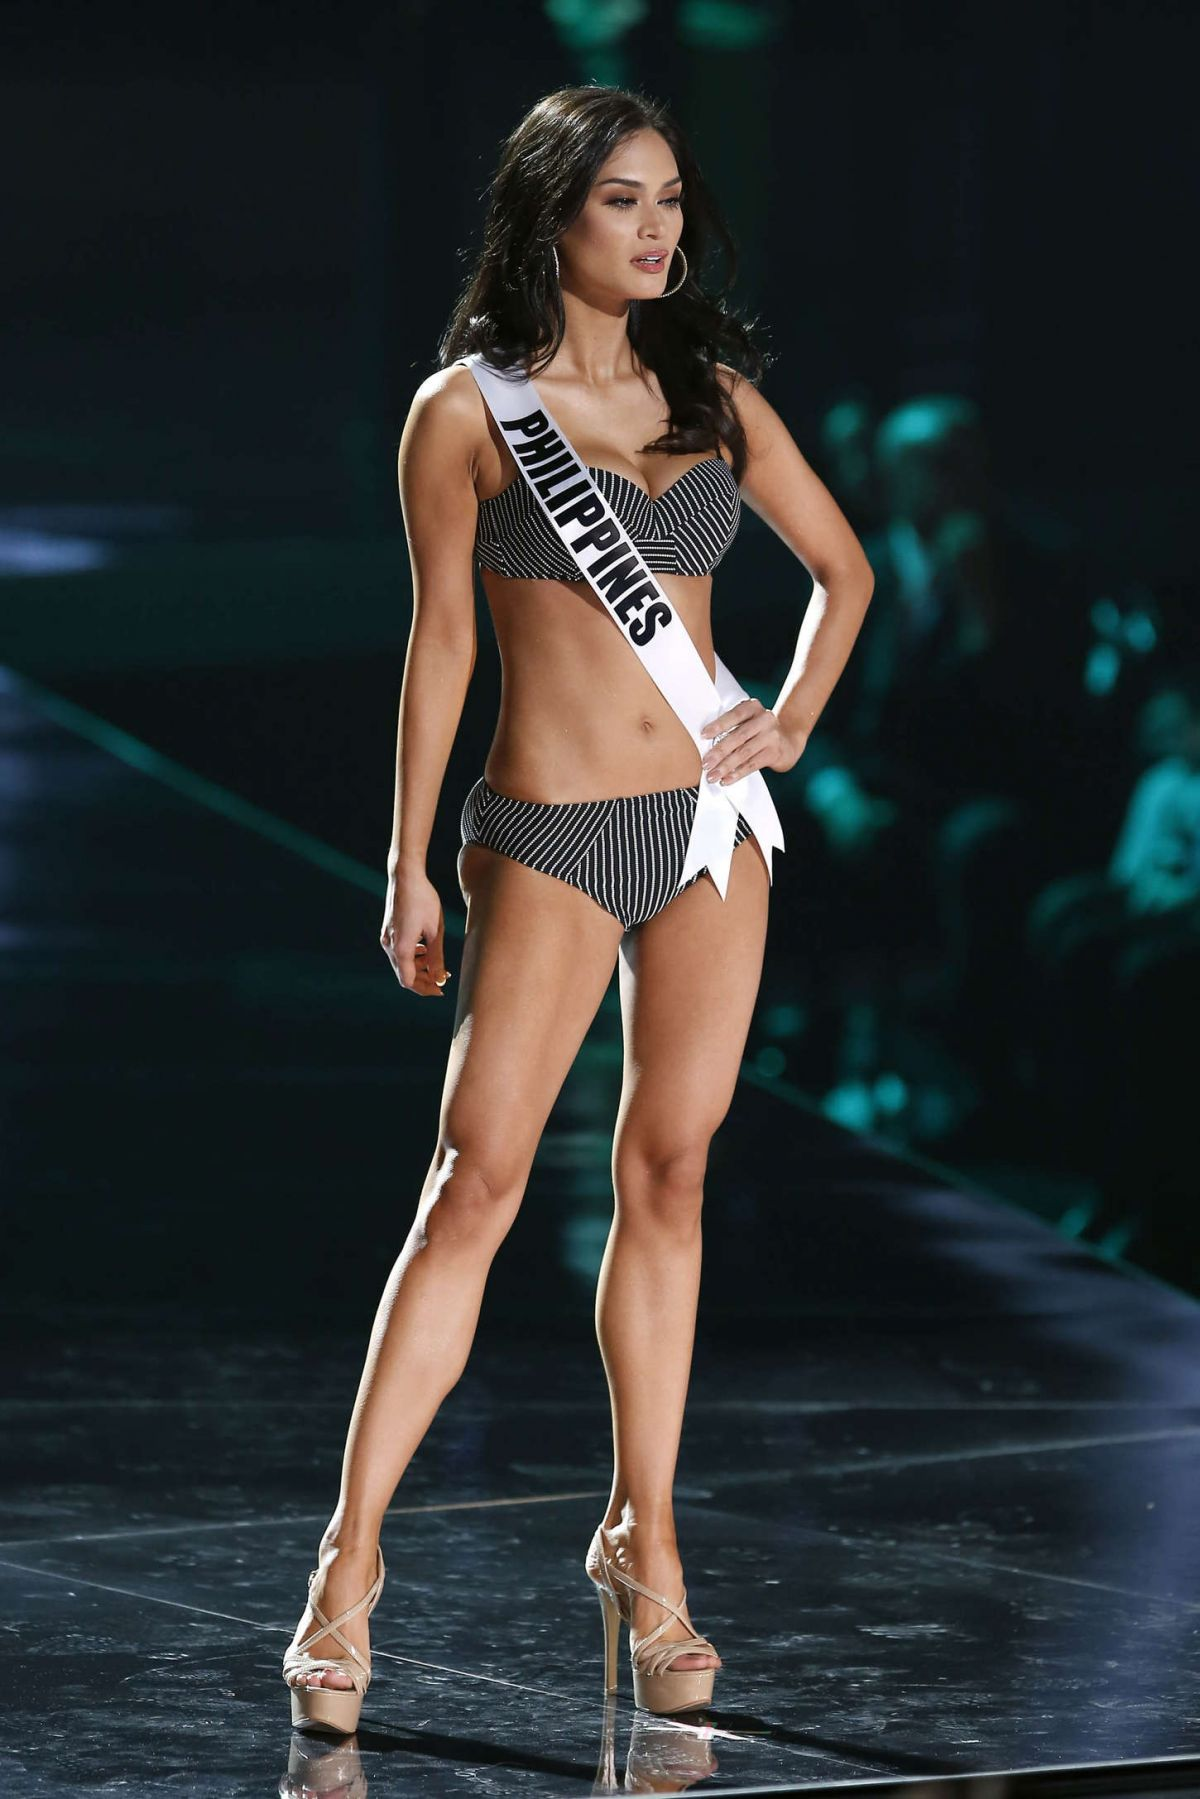 Miss bikini philippines idea simply